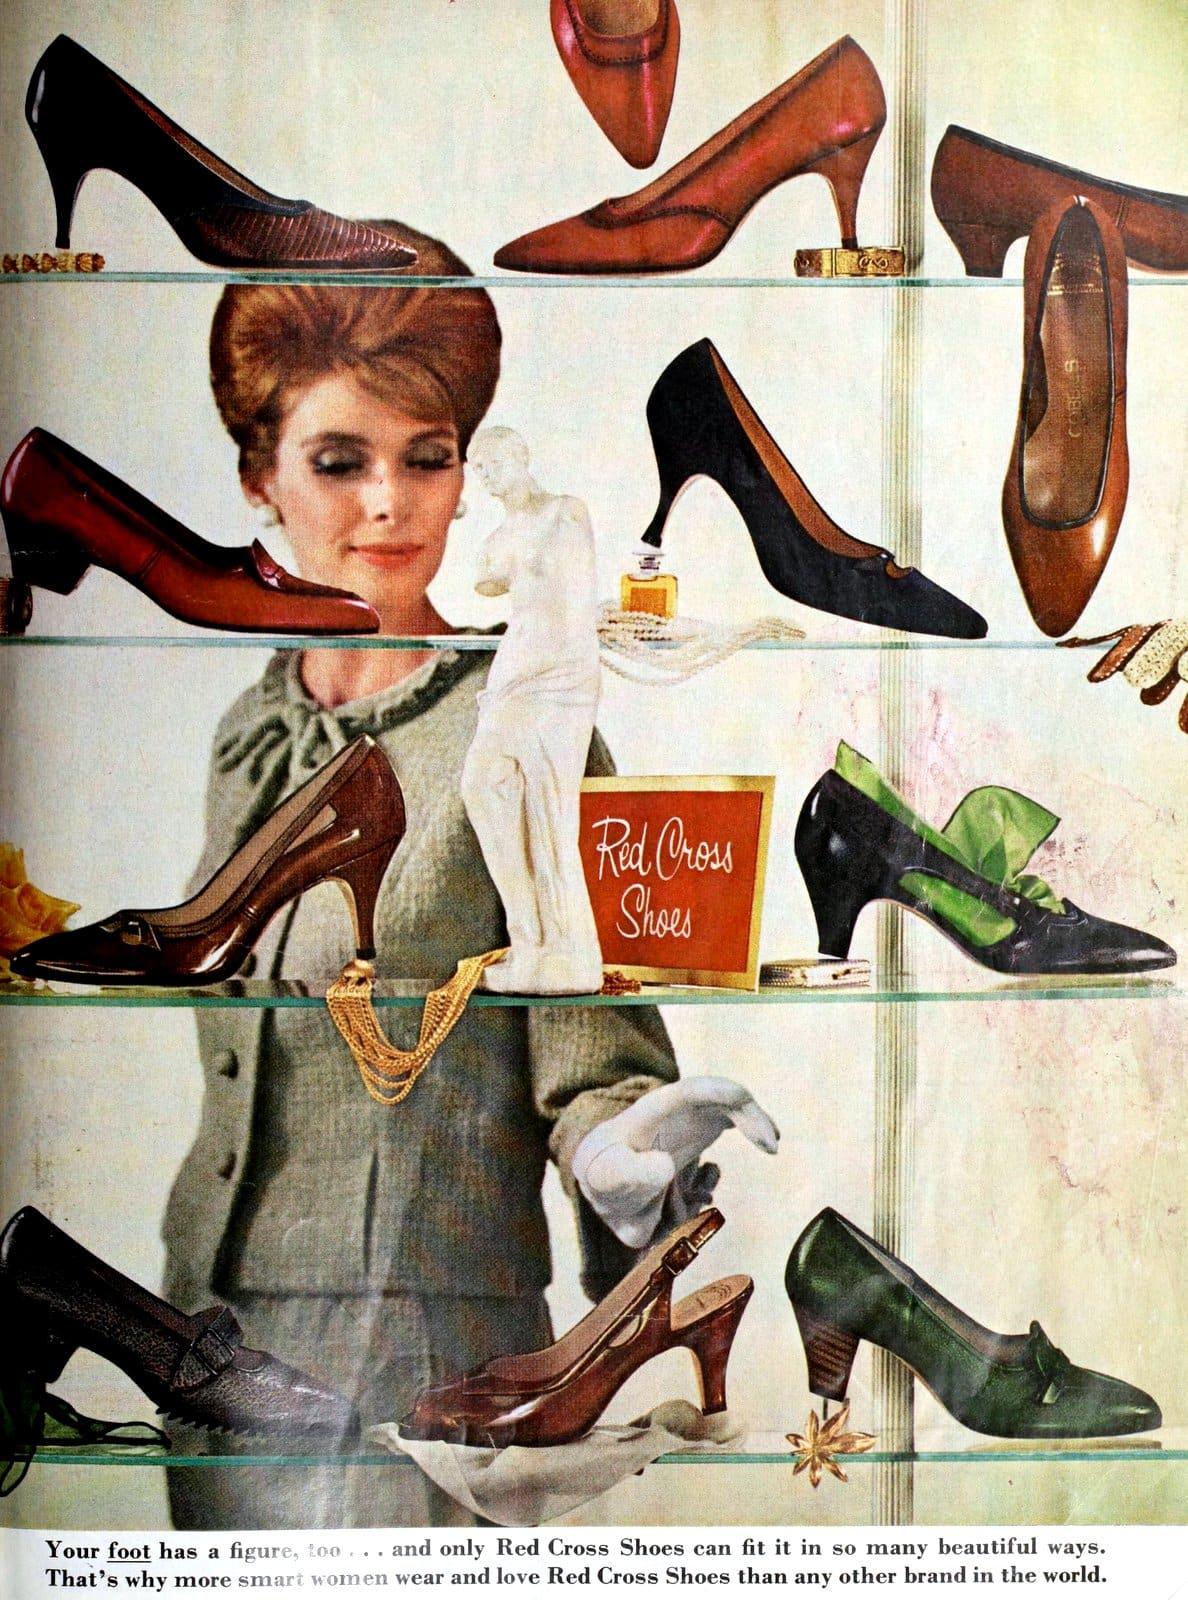 Red Cross Shoes - Footwear shopping in 1964